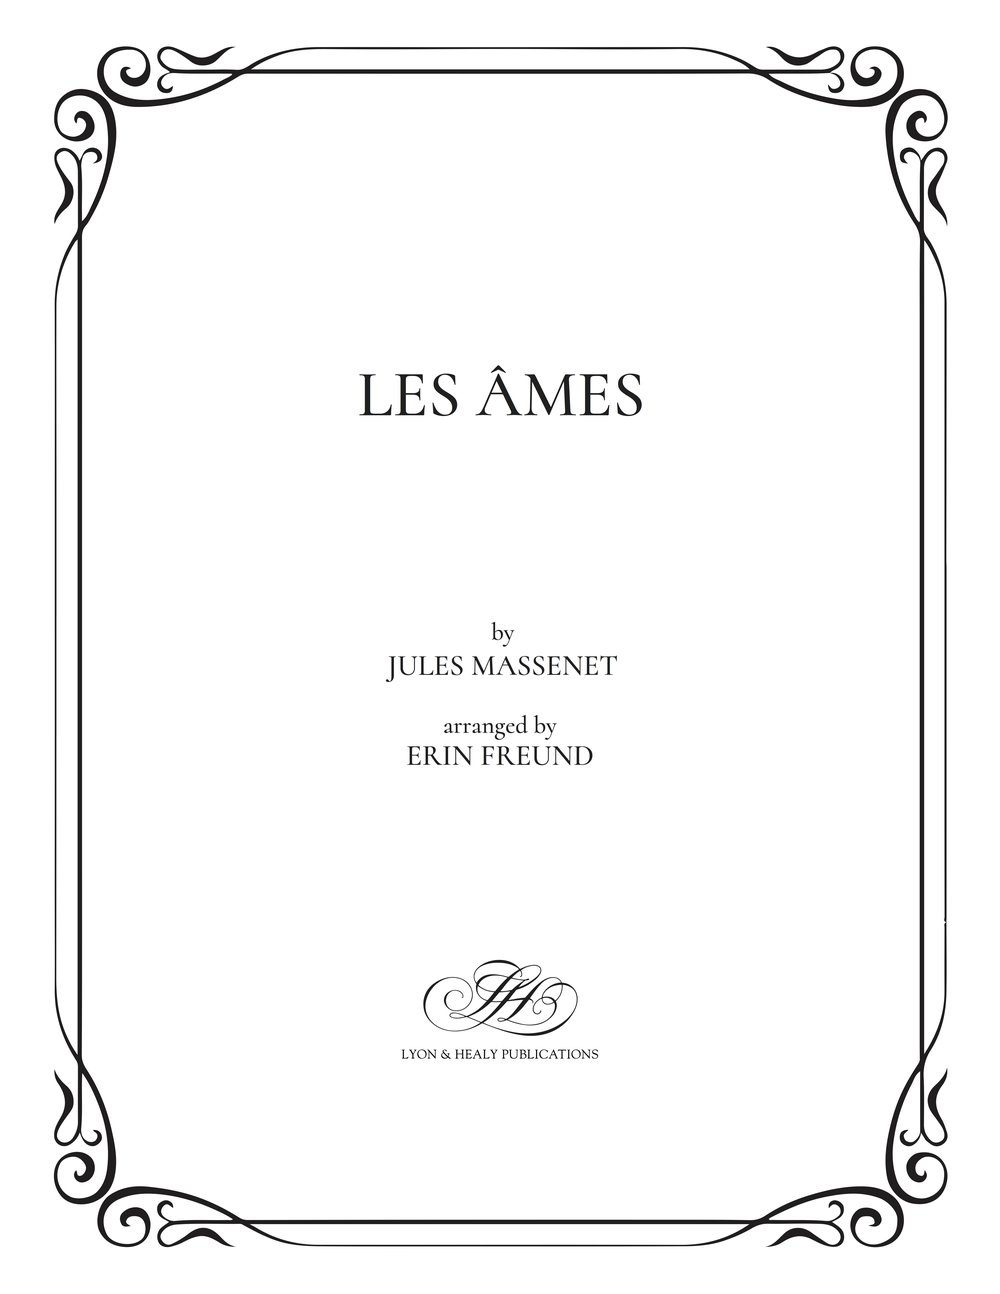 Les Âmes - Massenet-Freund cover.jpg